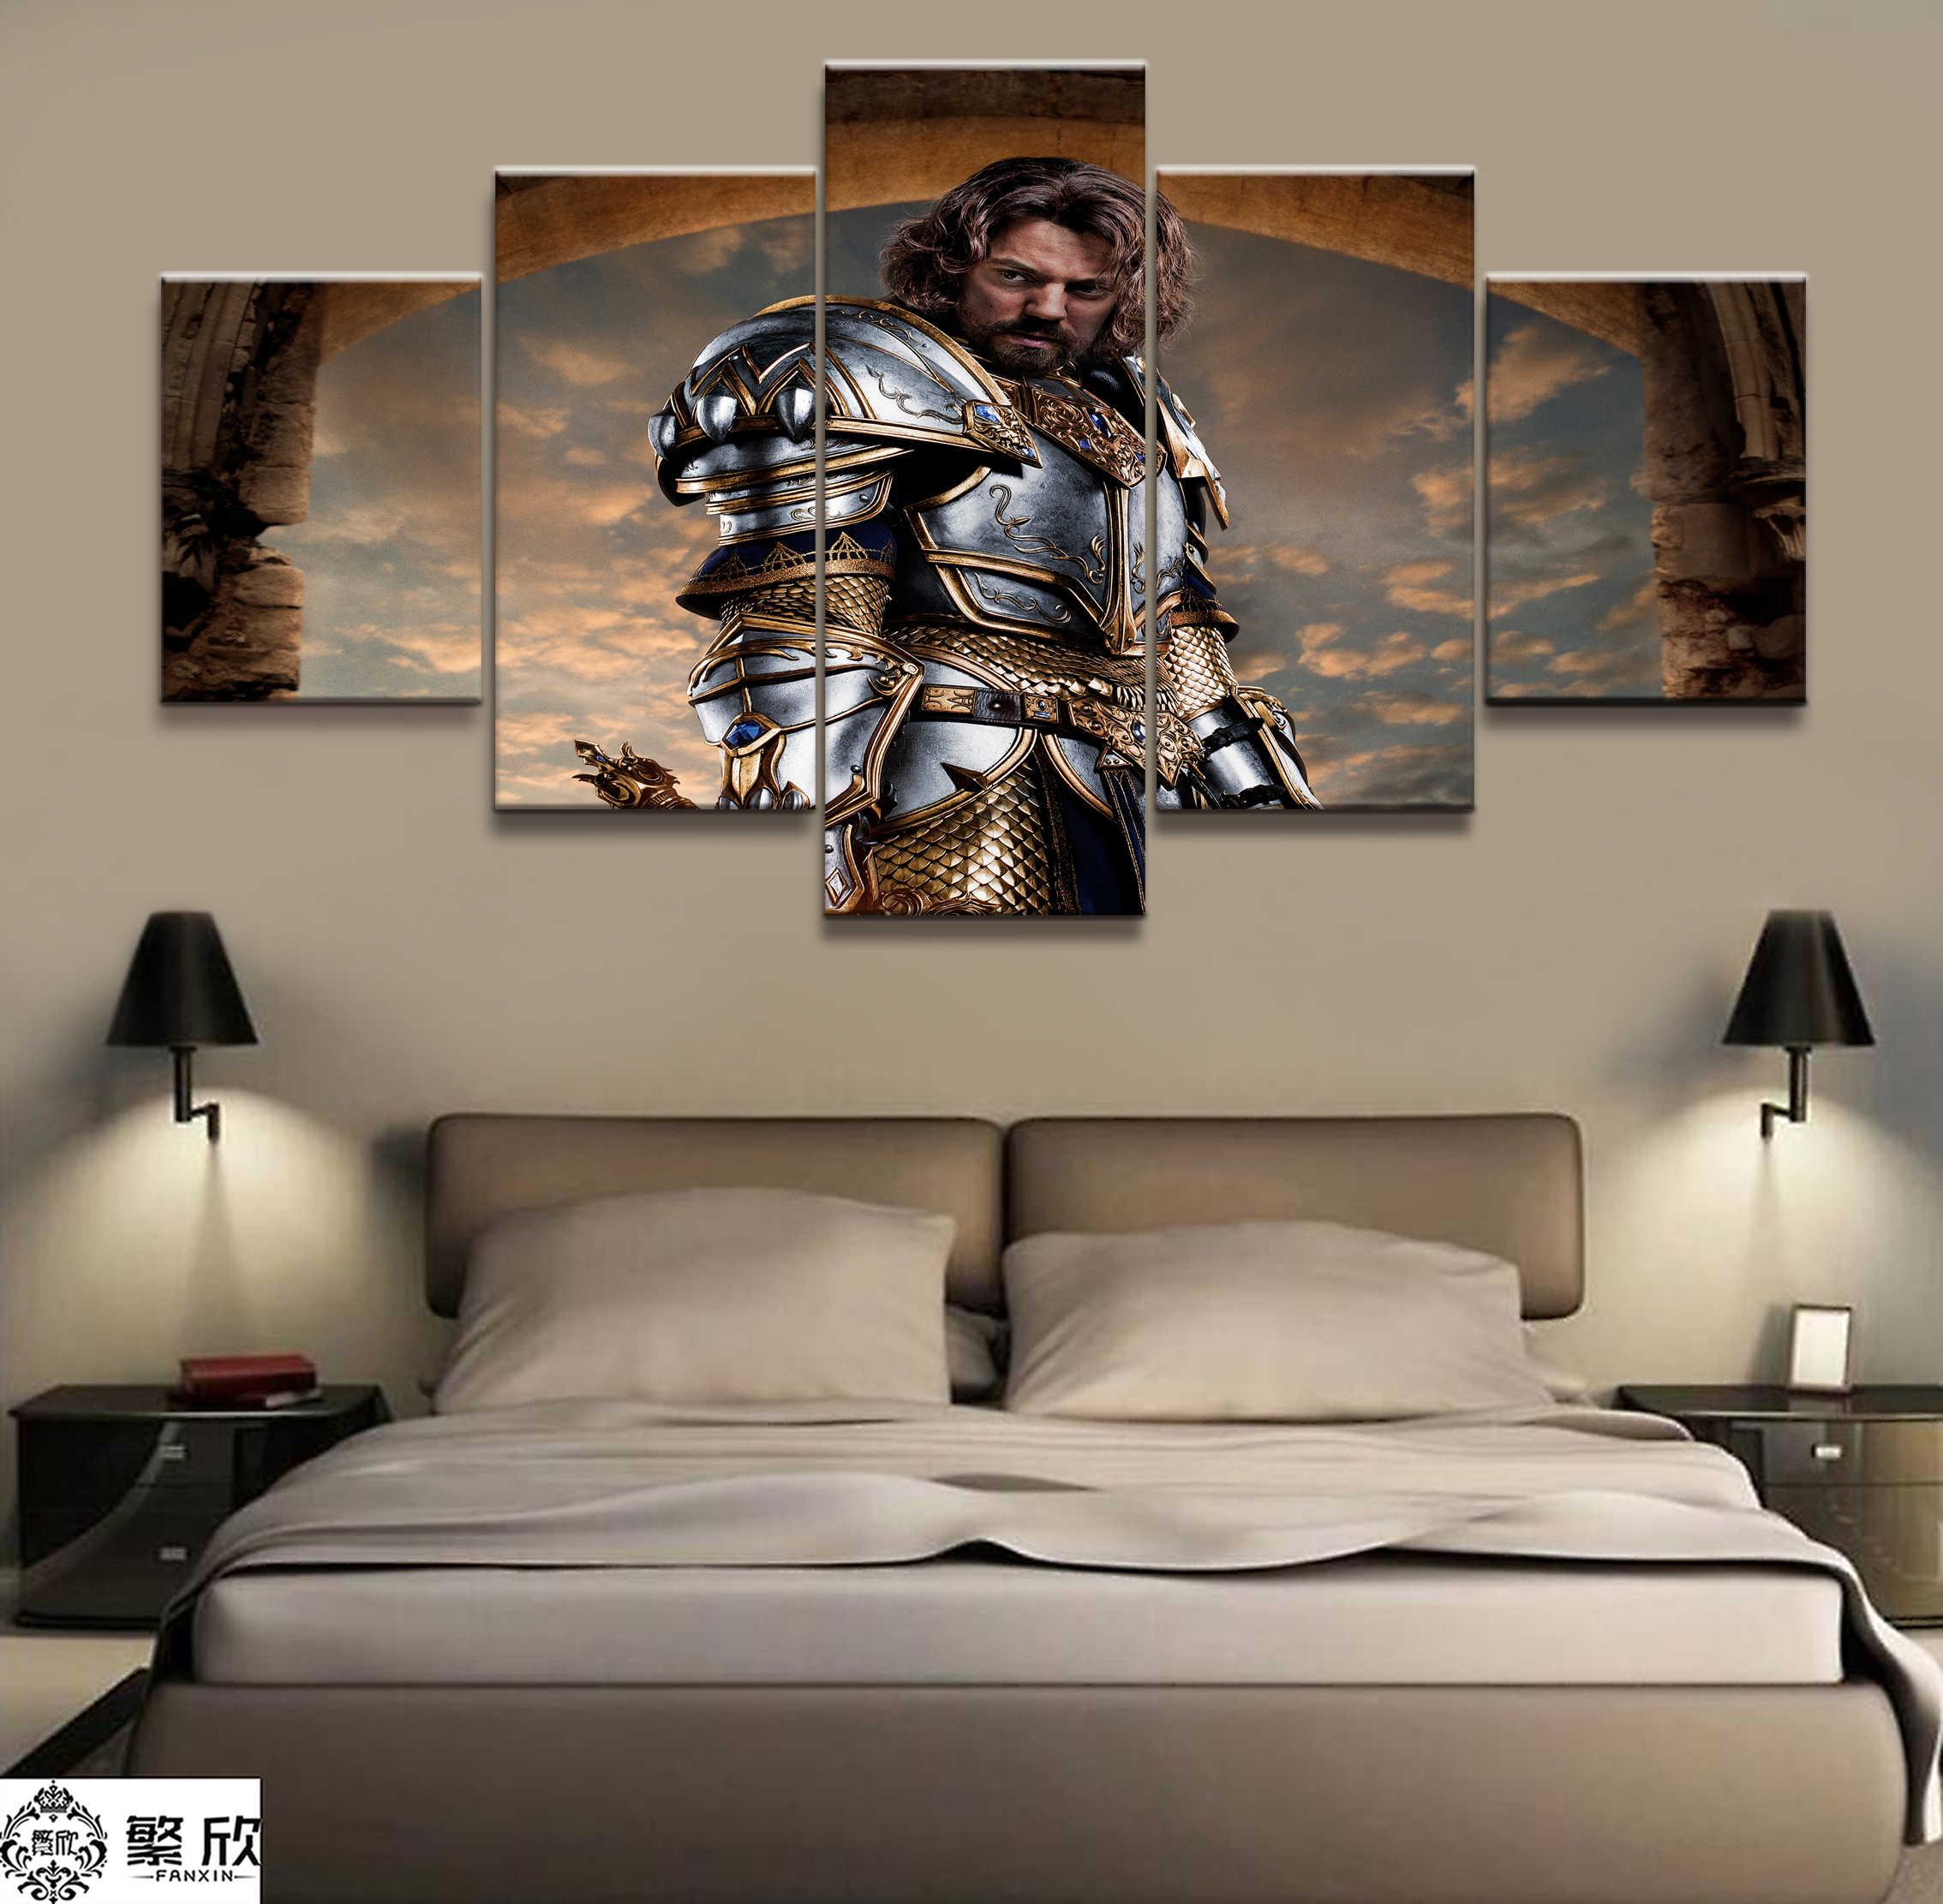 Peça 5 Video Game WOW Warcraft DOTA 2 Cartaz Pintura Decorativa Mural Art pintura Da Lona Da Parede Da Sala Decor atacado